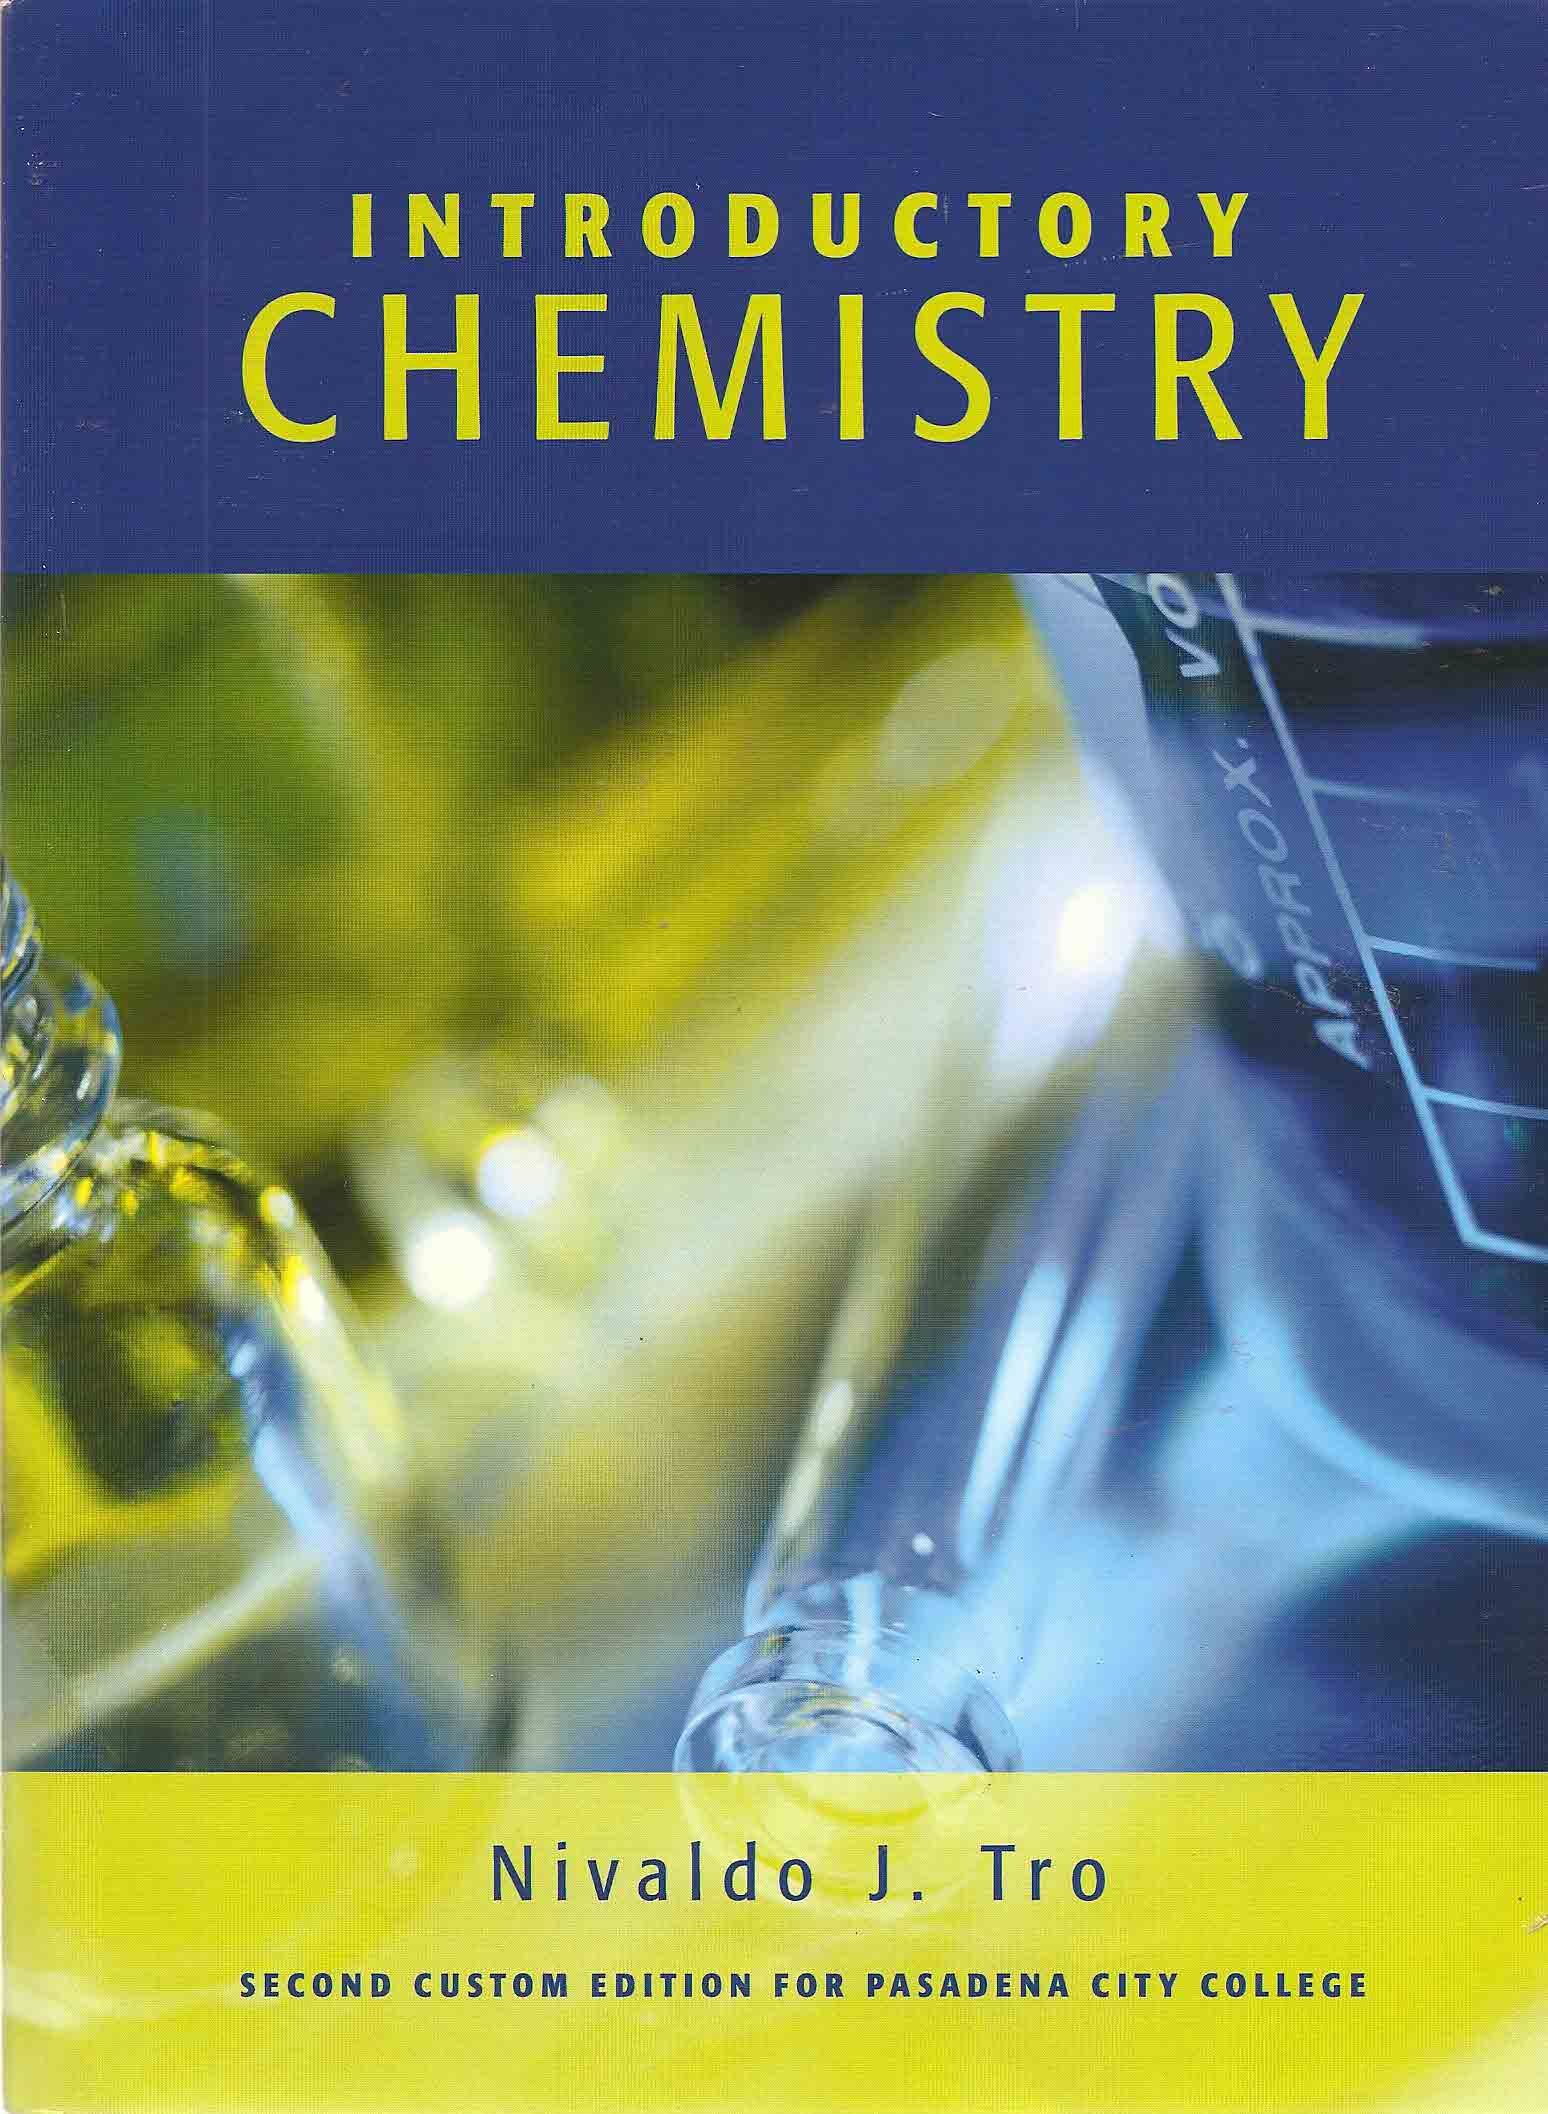 Introductory Chemistry (2nd Custom Edition for Pasadena City College):  Nivaldo J. Tro: 9780536647368: Amazon.com: Books